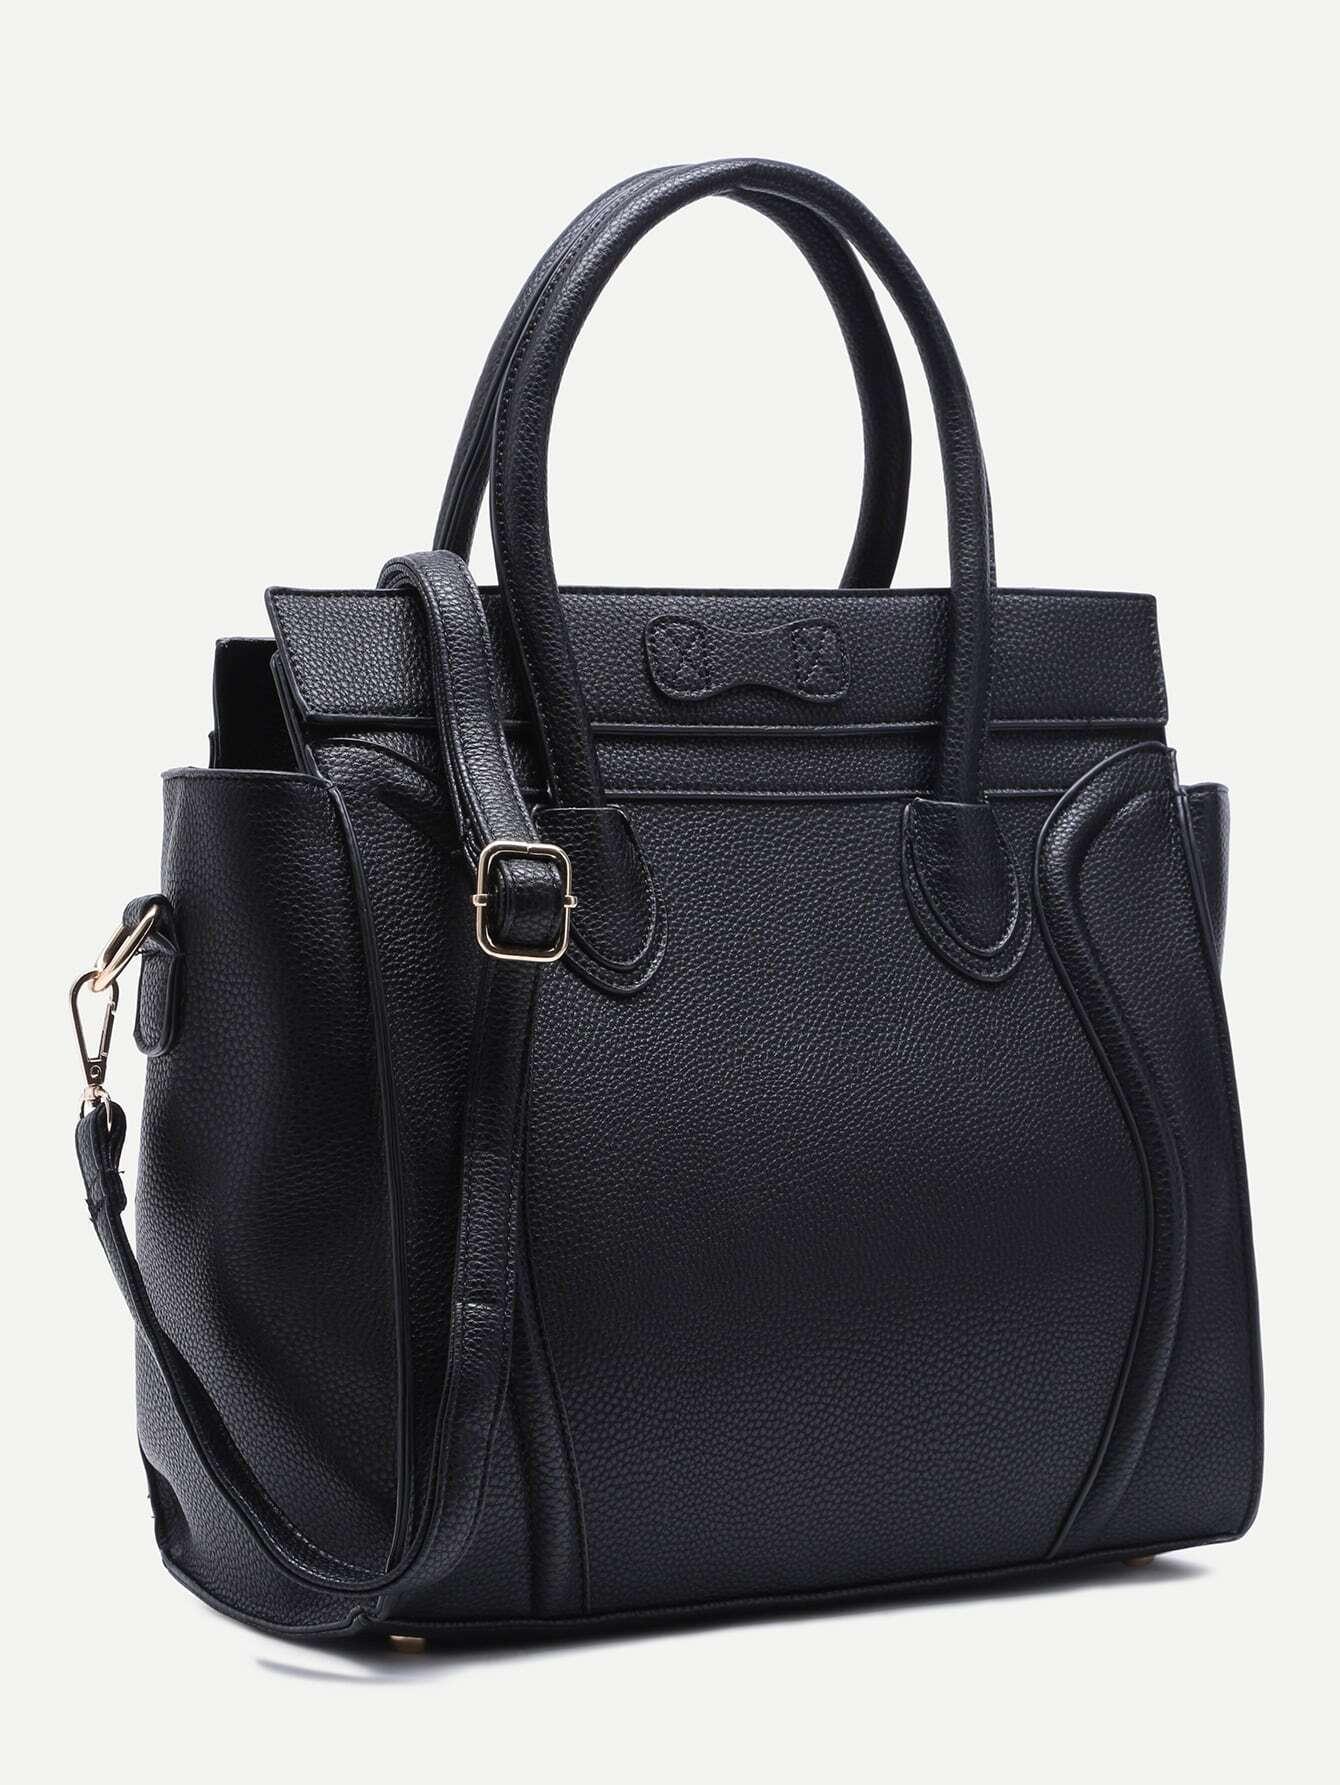 bag161018904_2